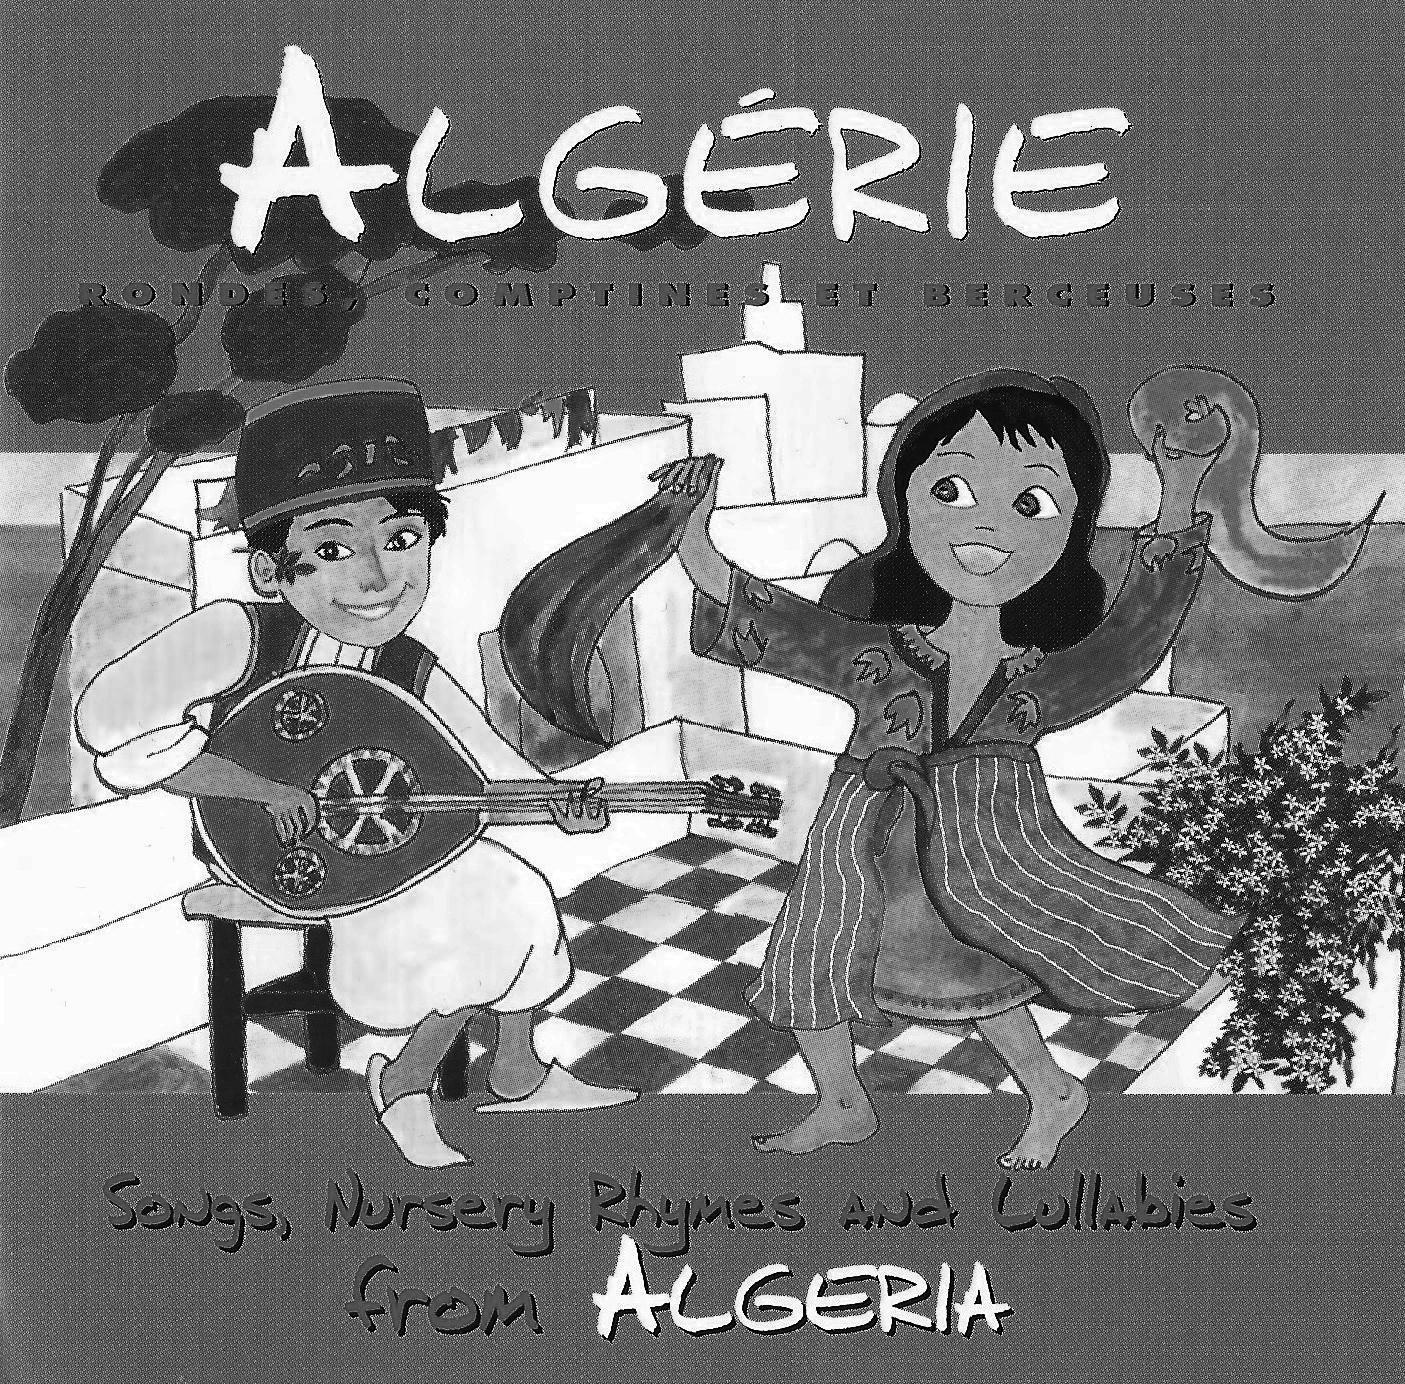 3.Algerie, Rondes Comptines et Berceuses - black